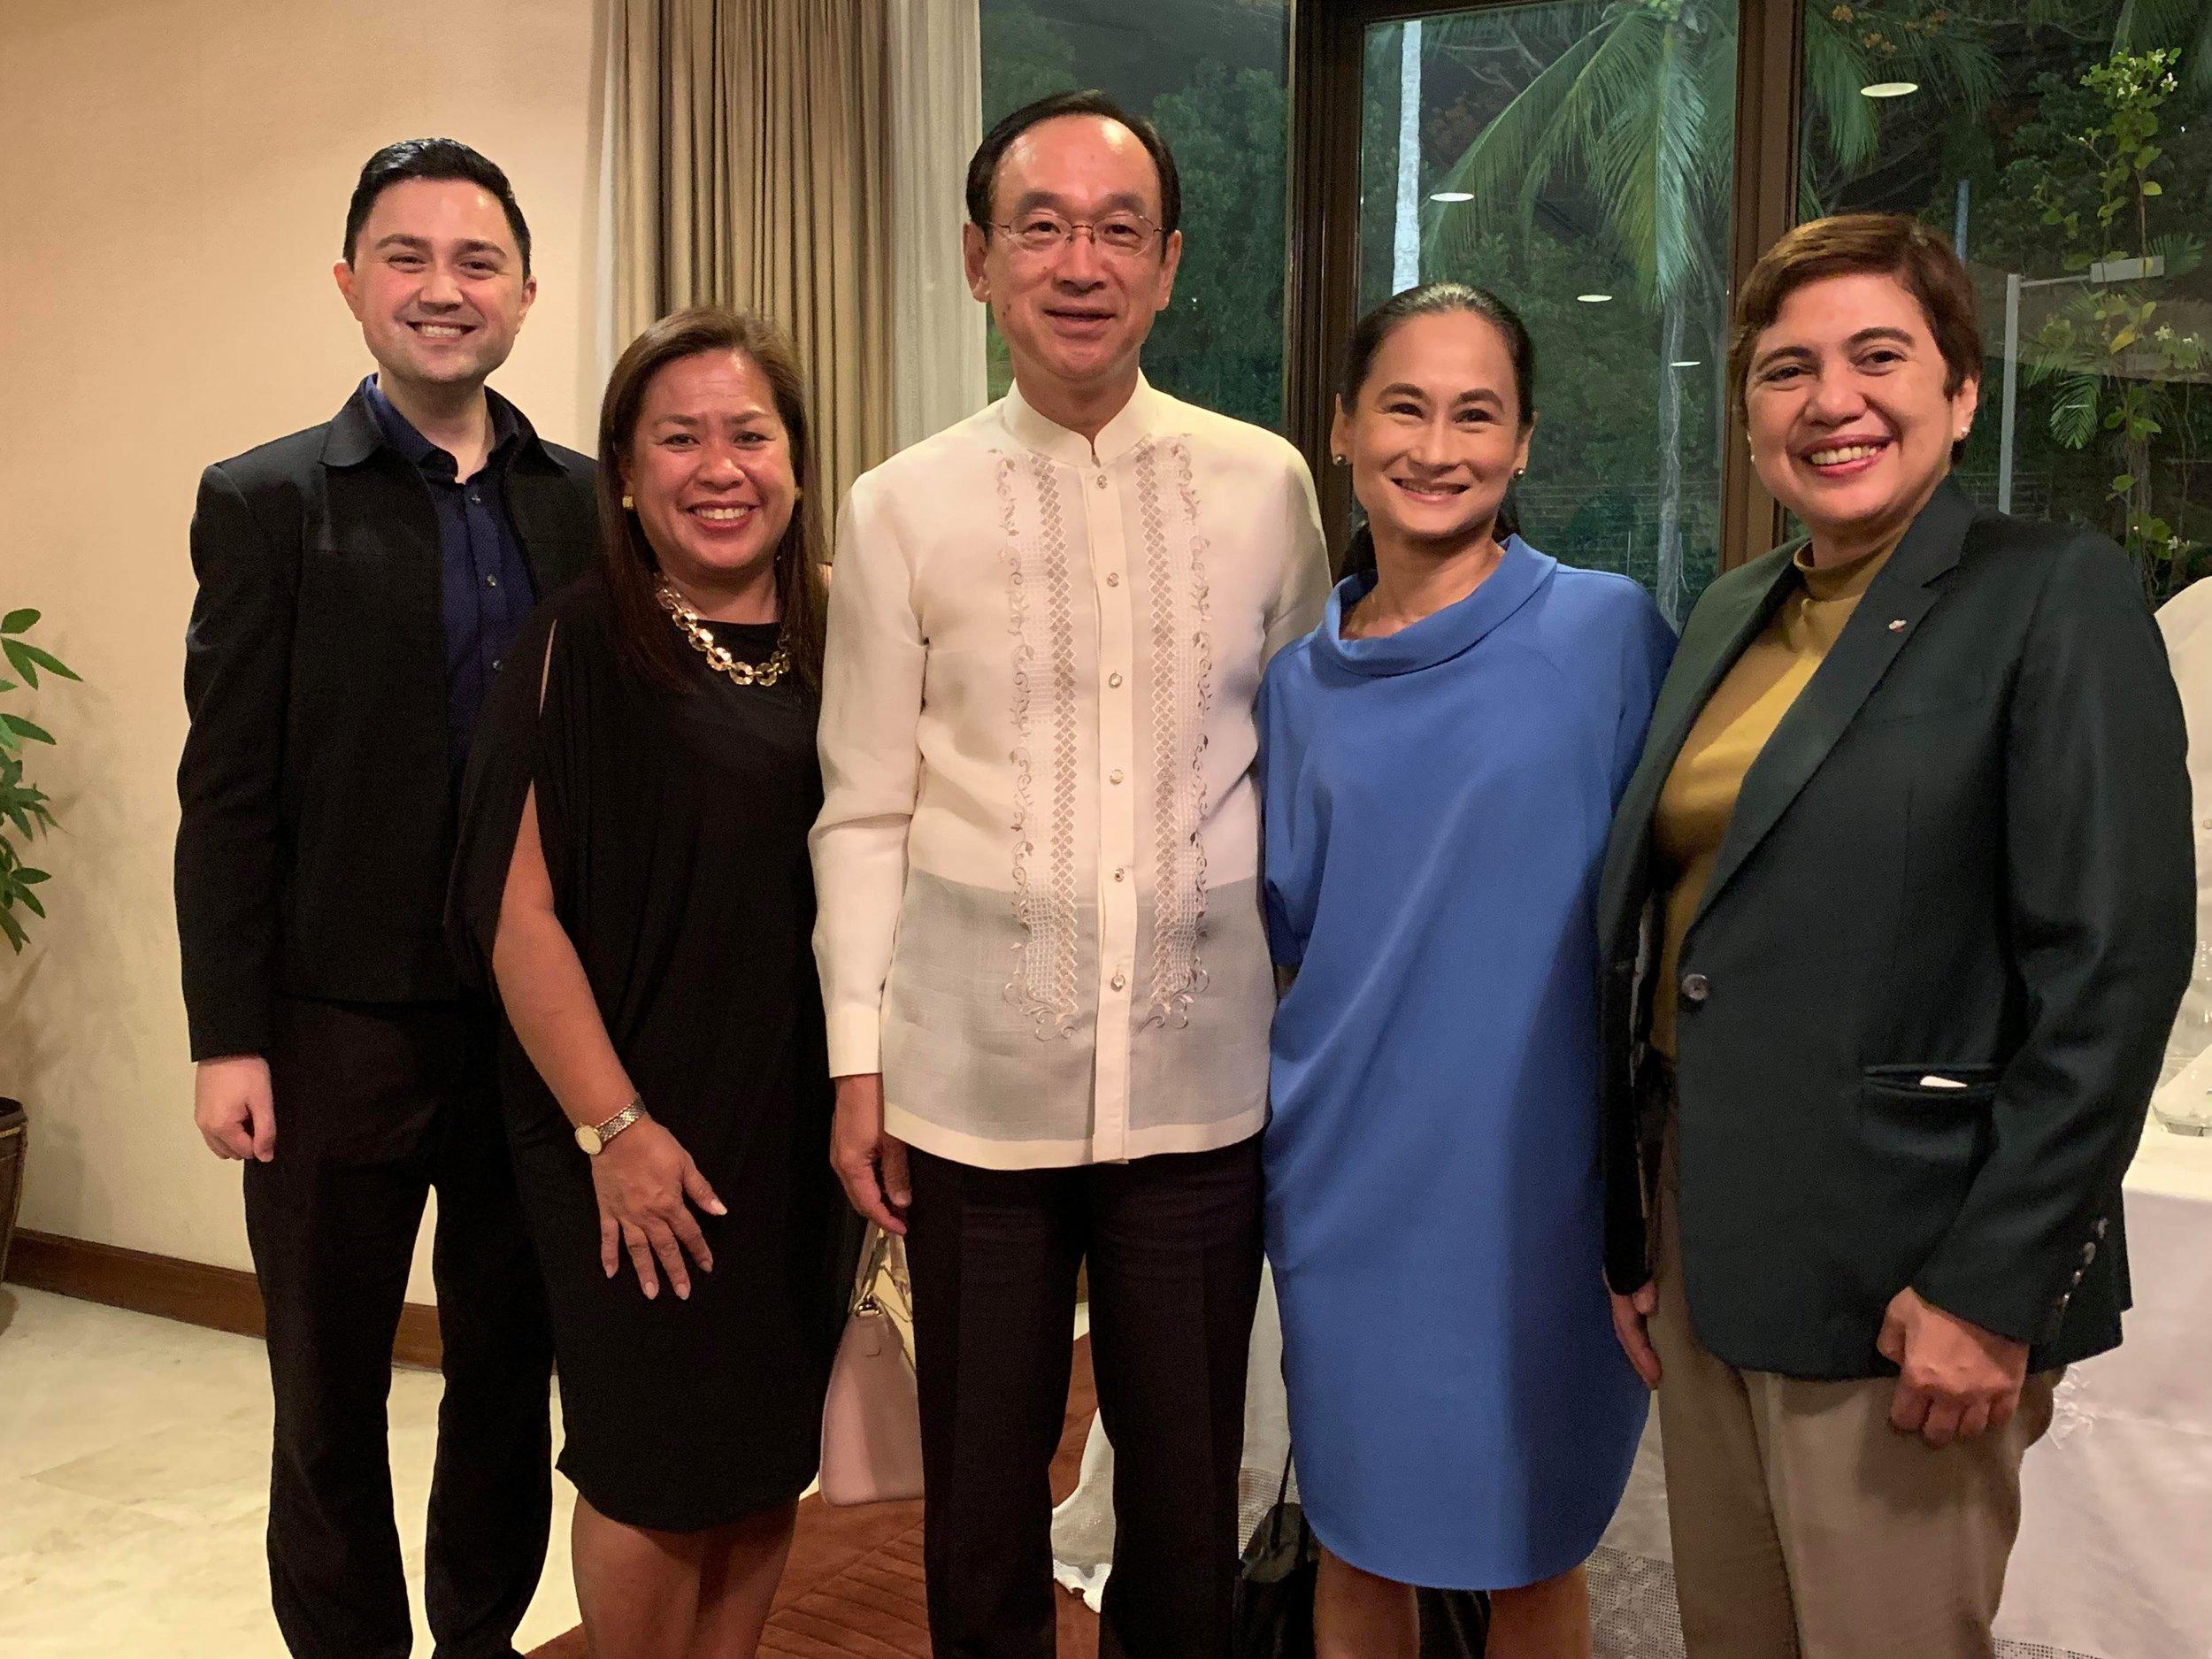 Ambassador Haneda with Ballet Manila's Lisa Macuja-Elizalde and representatives of EON (from left) – Adam Crayne, Angelica Pettersson and Angela Blardony Ureta. Photo by Mark Sumaylo